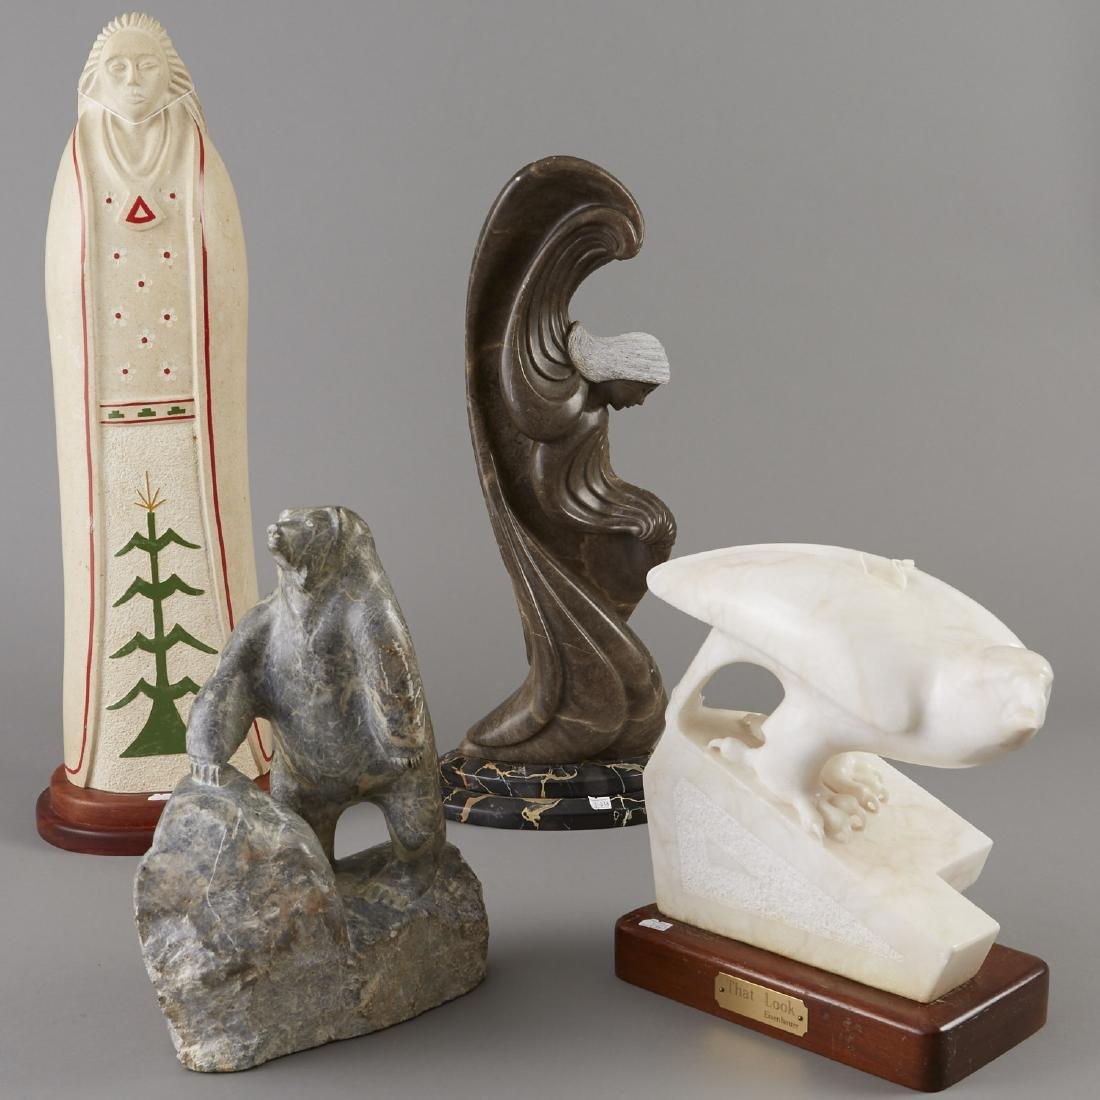 4 Stone Sculptures Fragua, Nanimahoo, Callor etc.